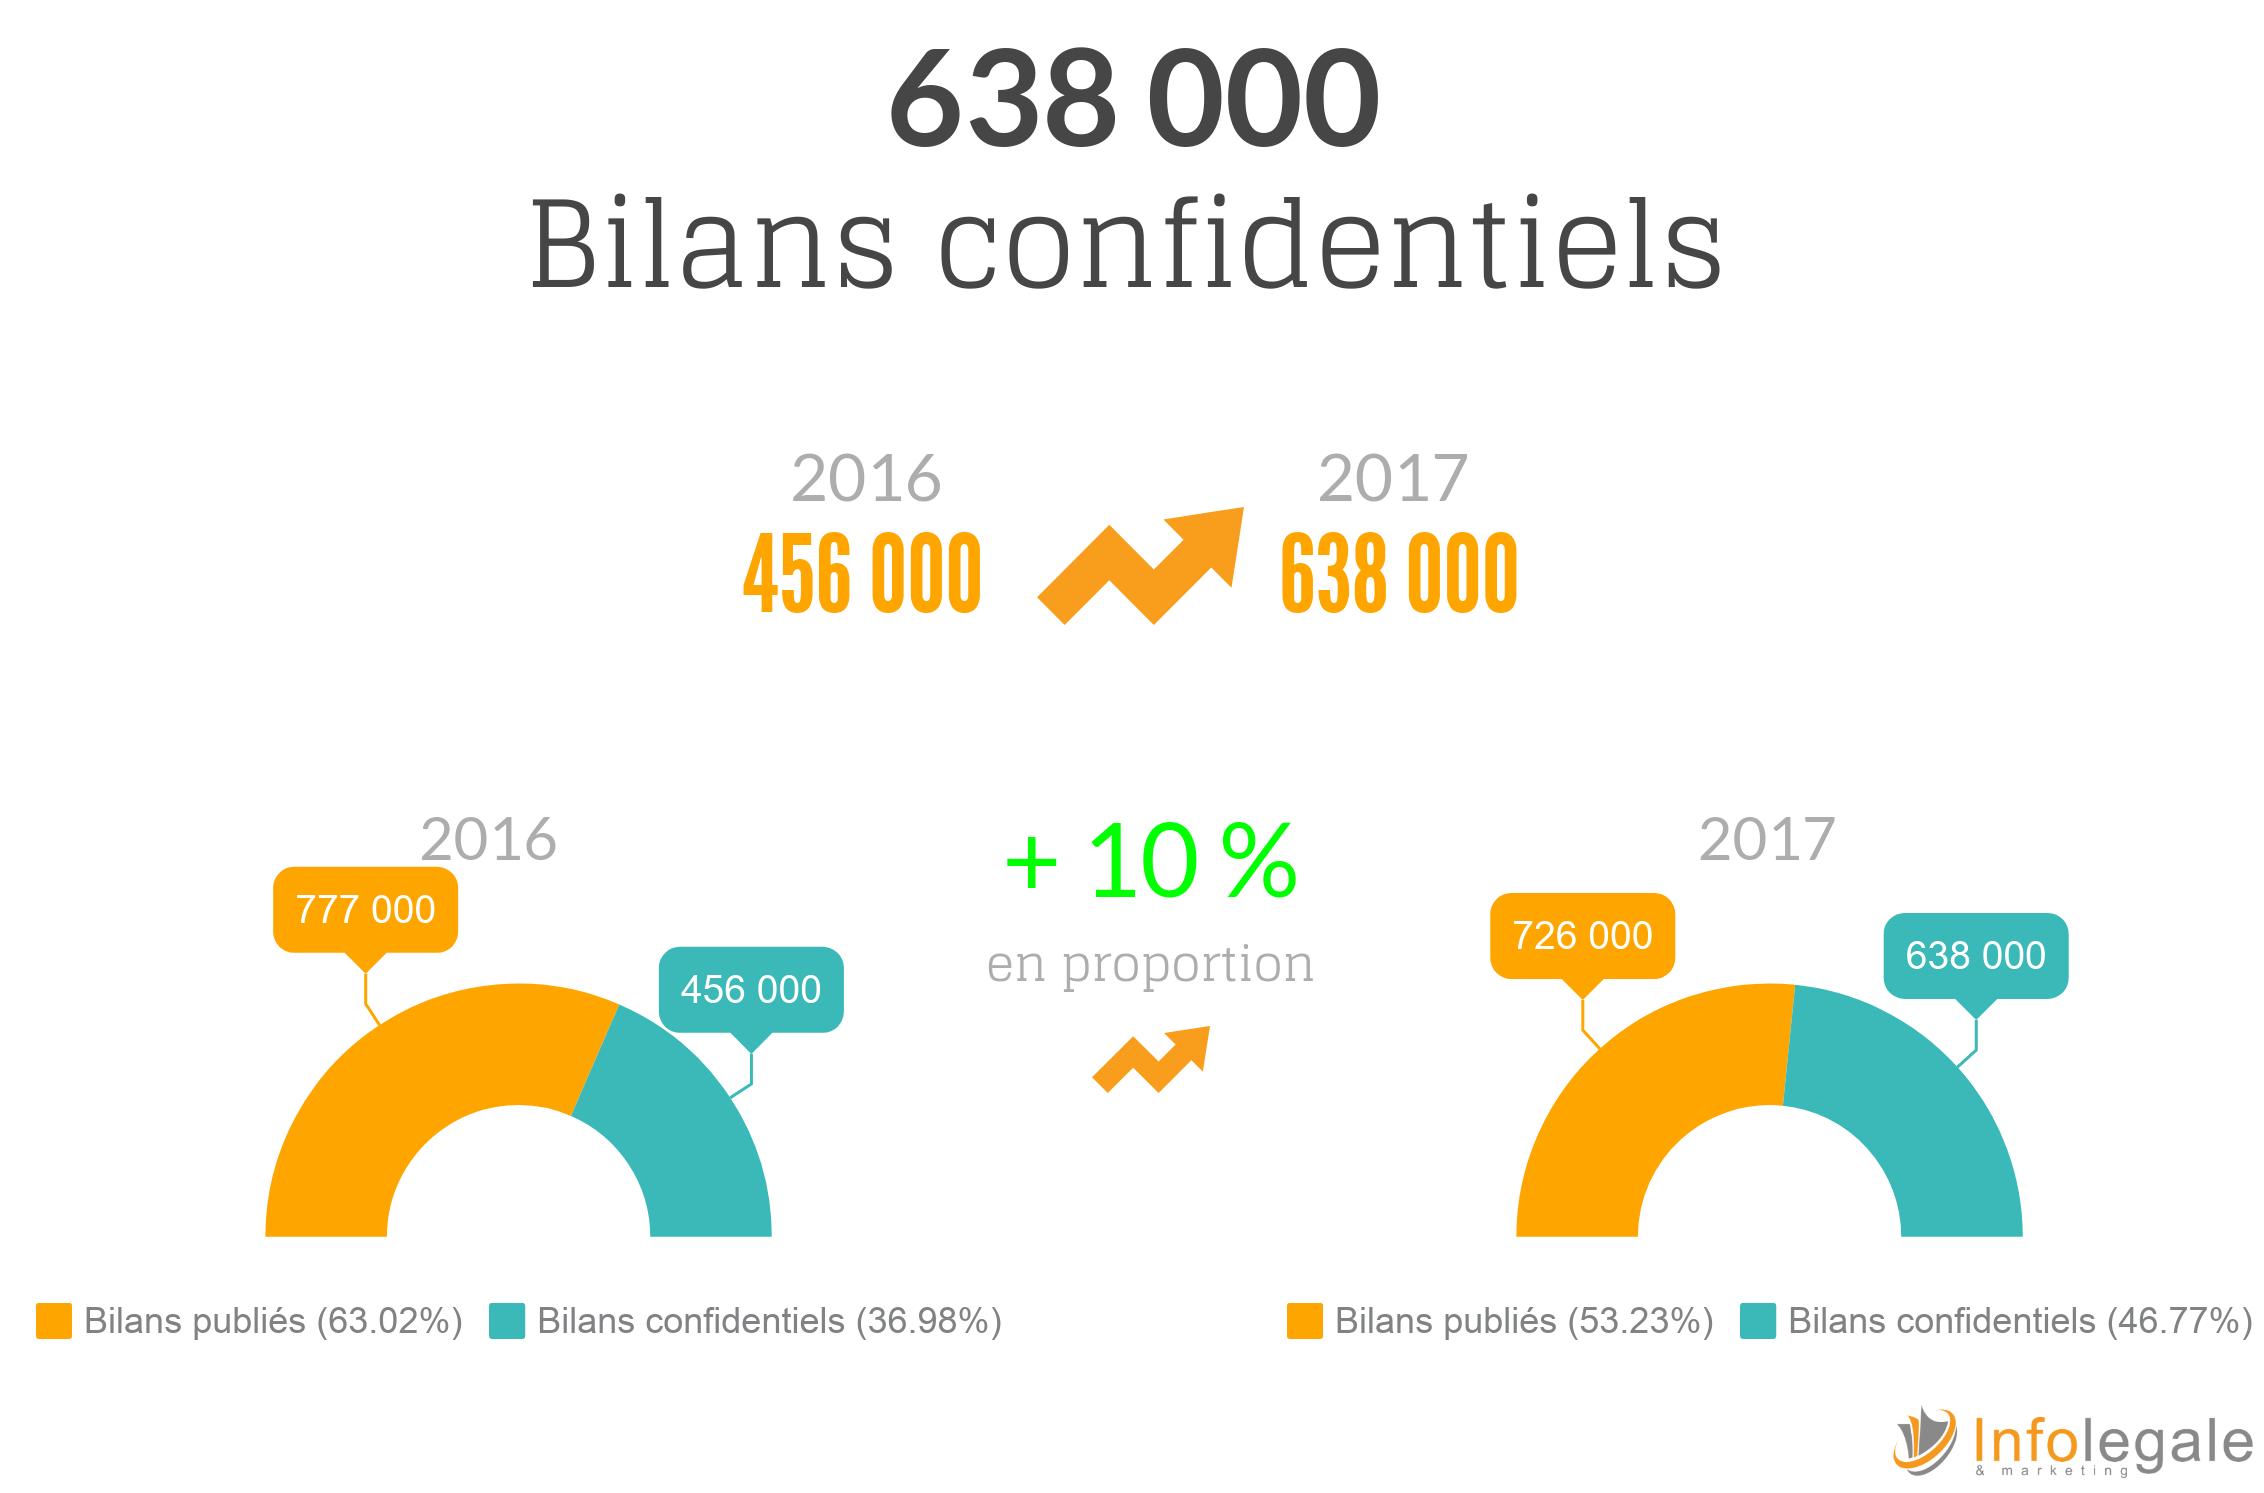 bilans confidentiels : succes du dispositif